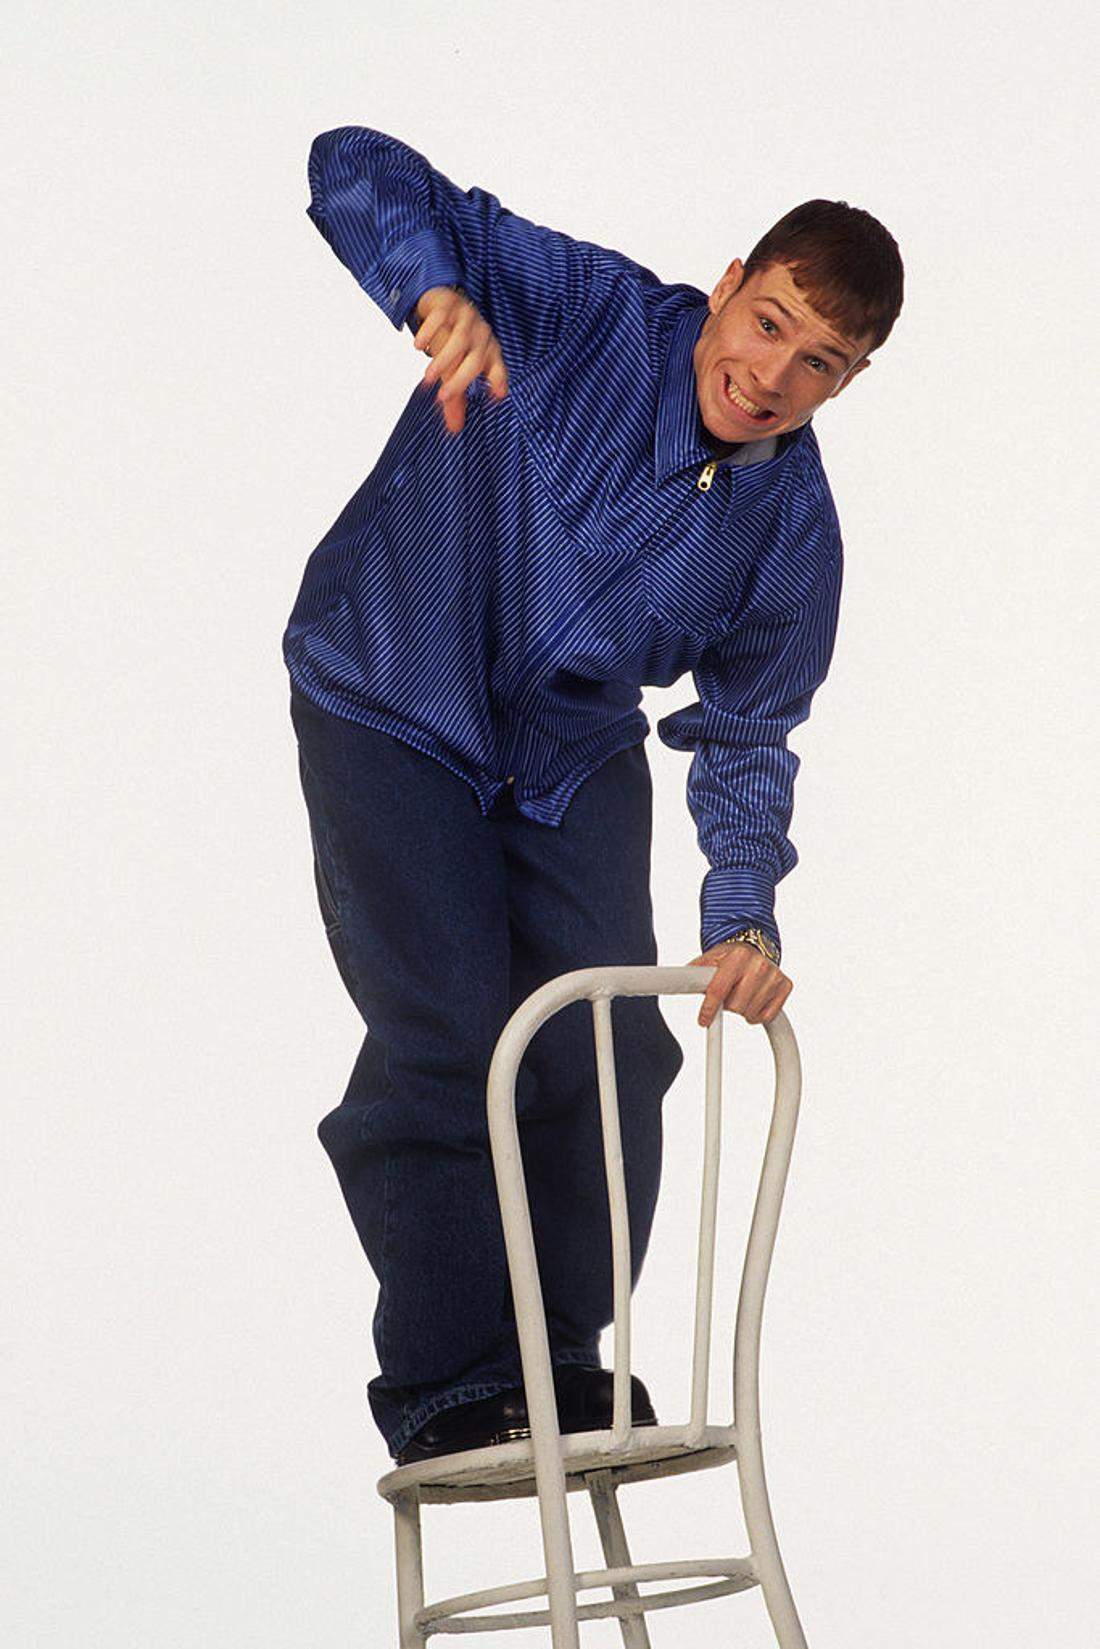 Brian Litrell falling off a chair